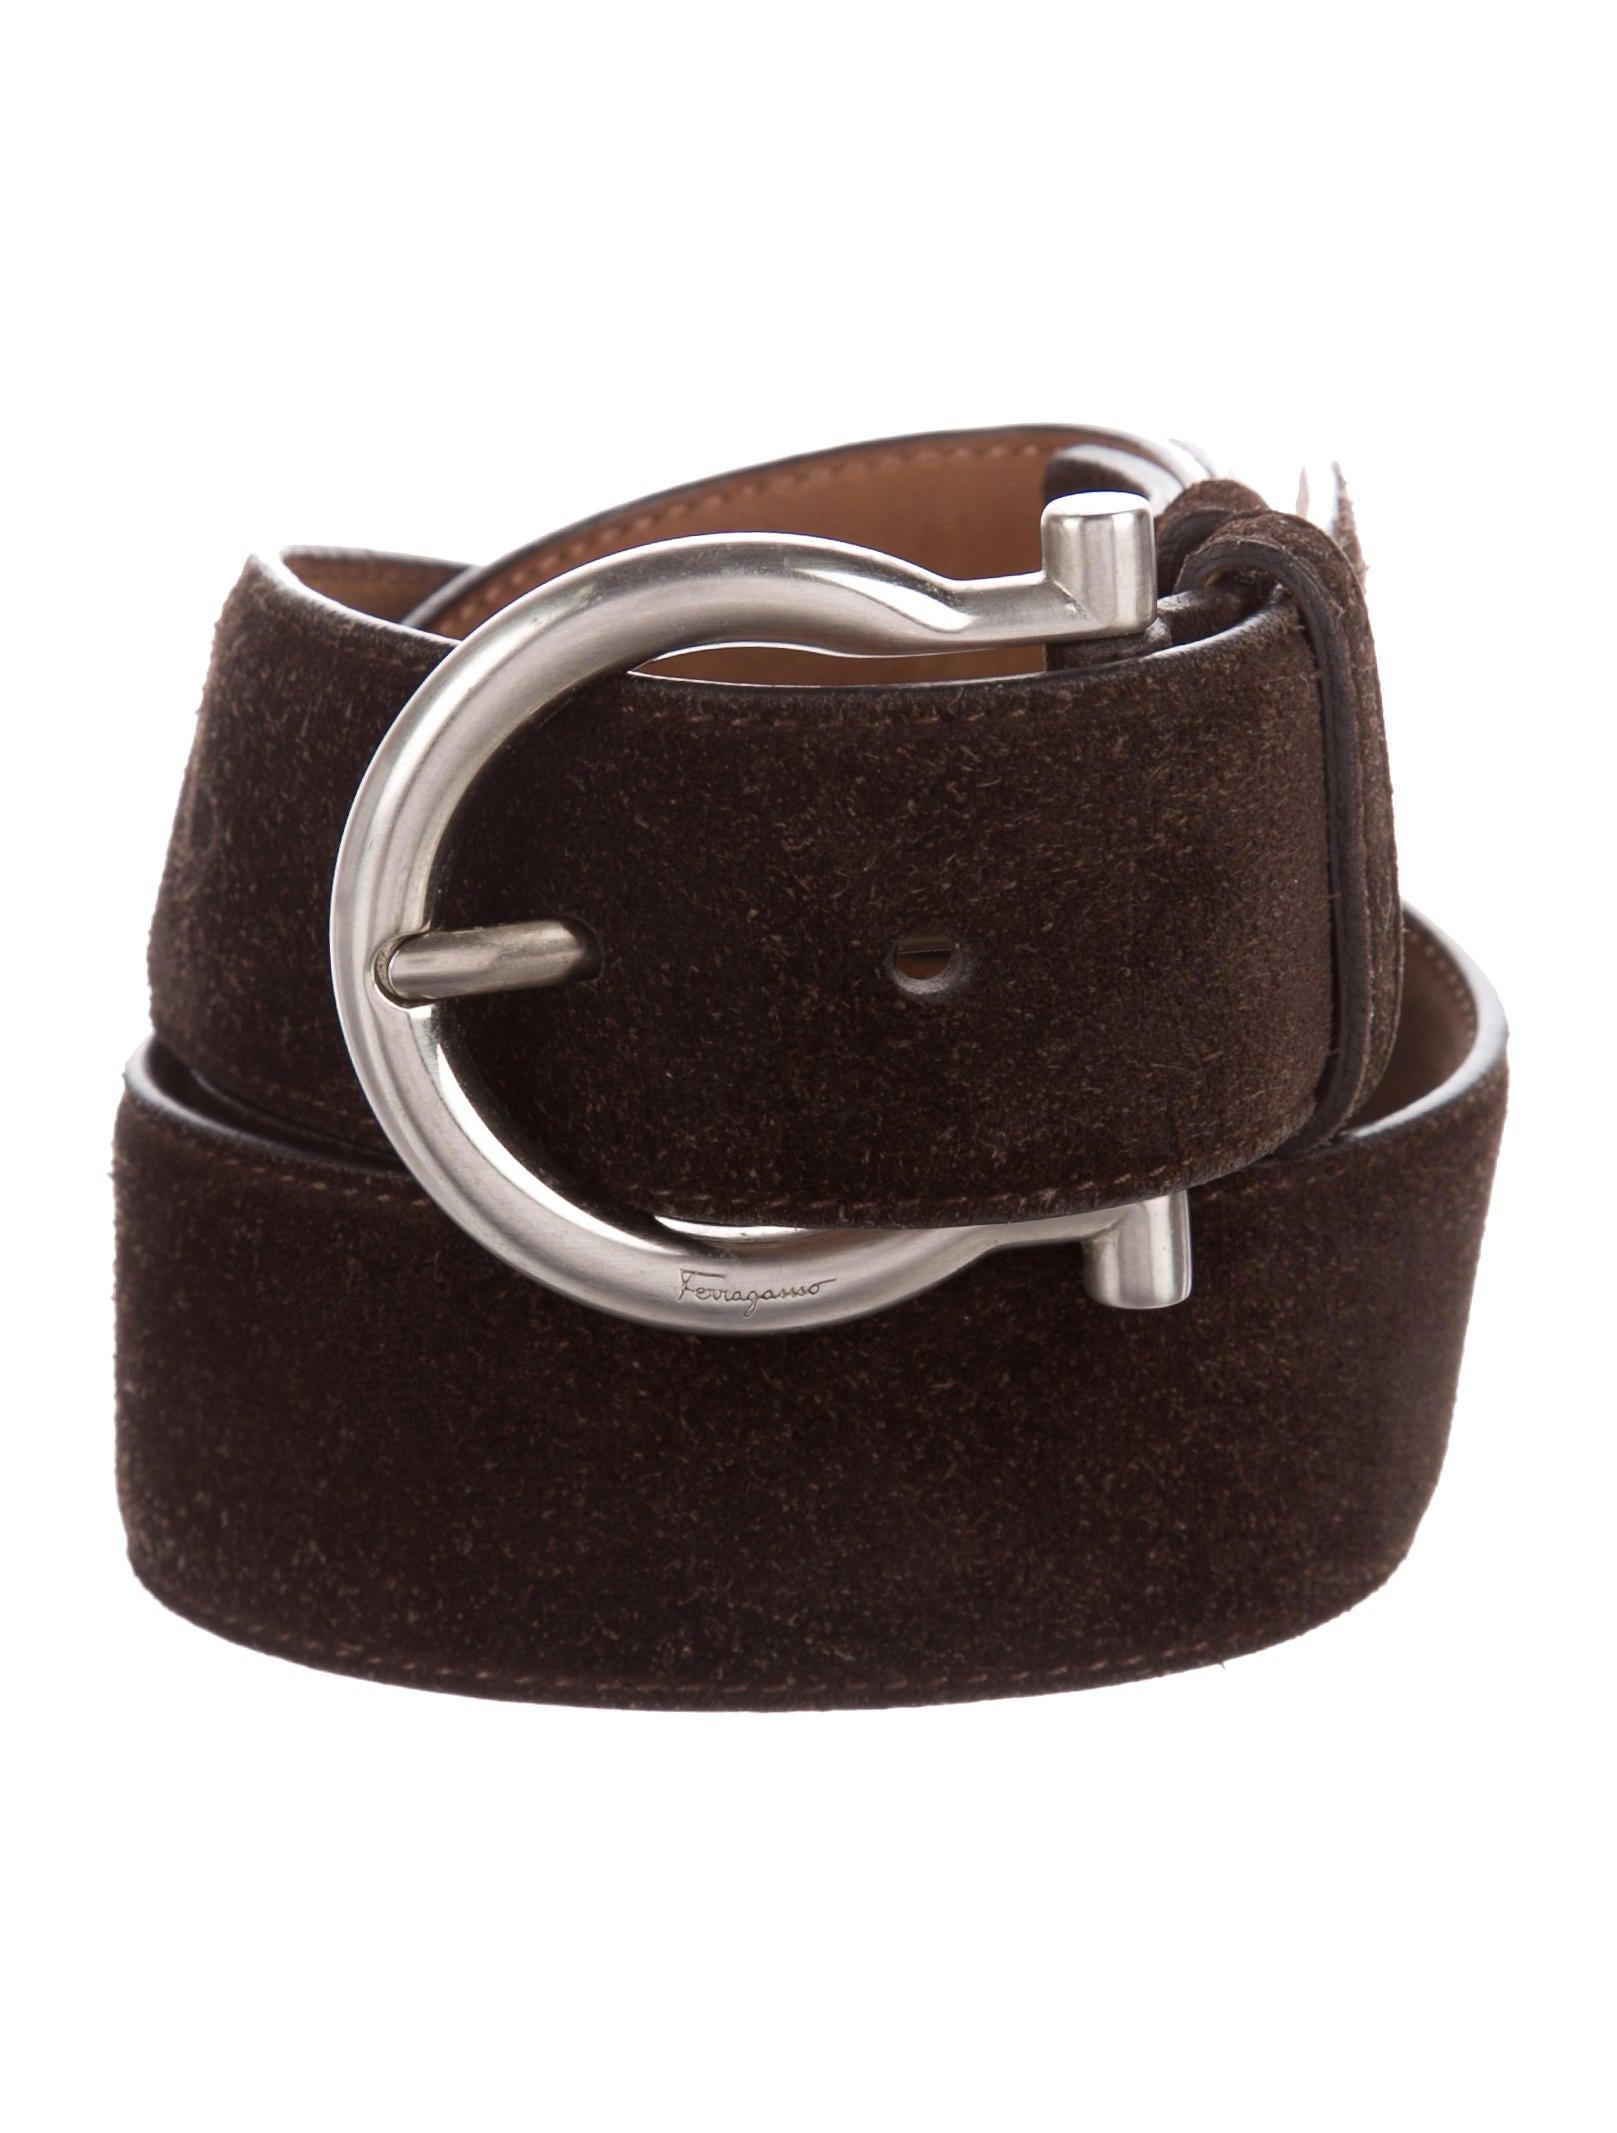 dde86897c4b Salvatore Ferragamo Suede Buckle Belt - Accessories - SAL57902 | The ...